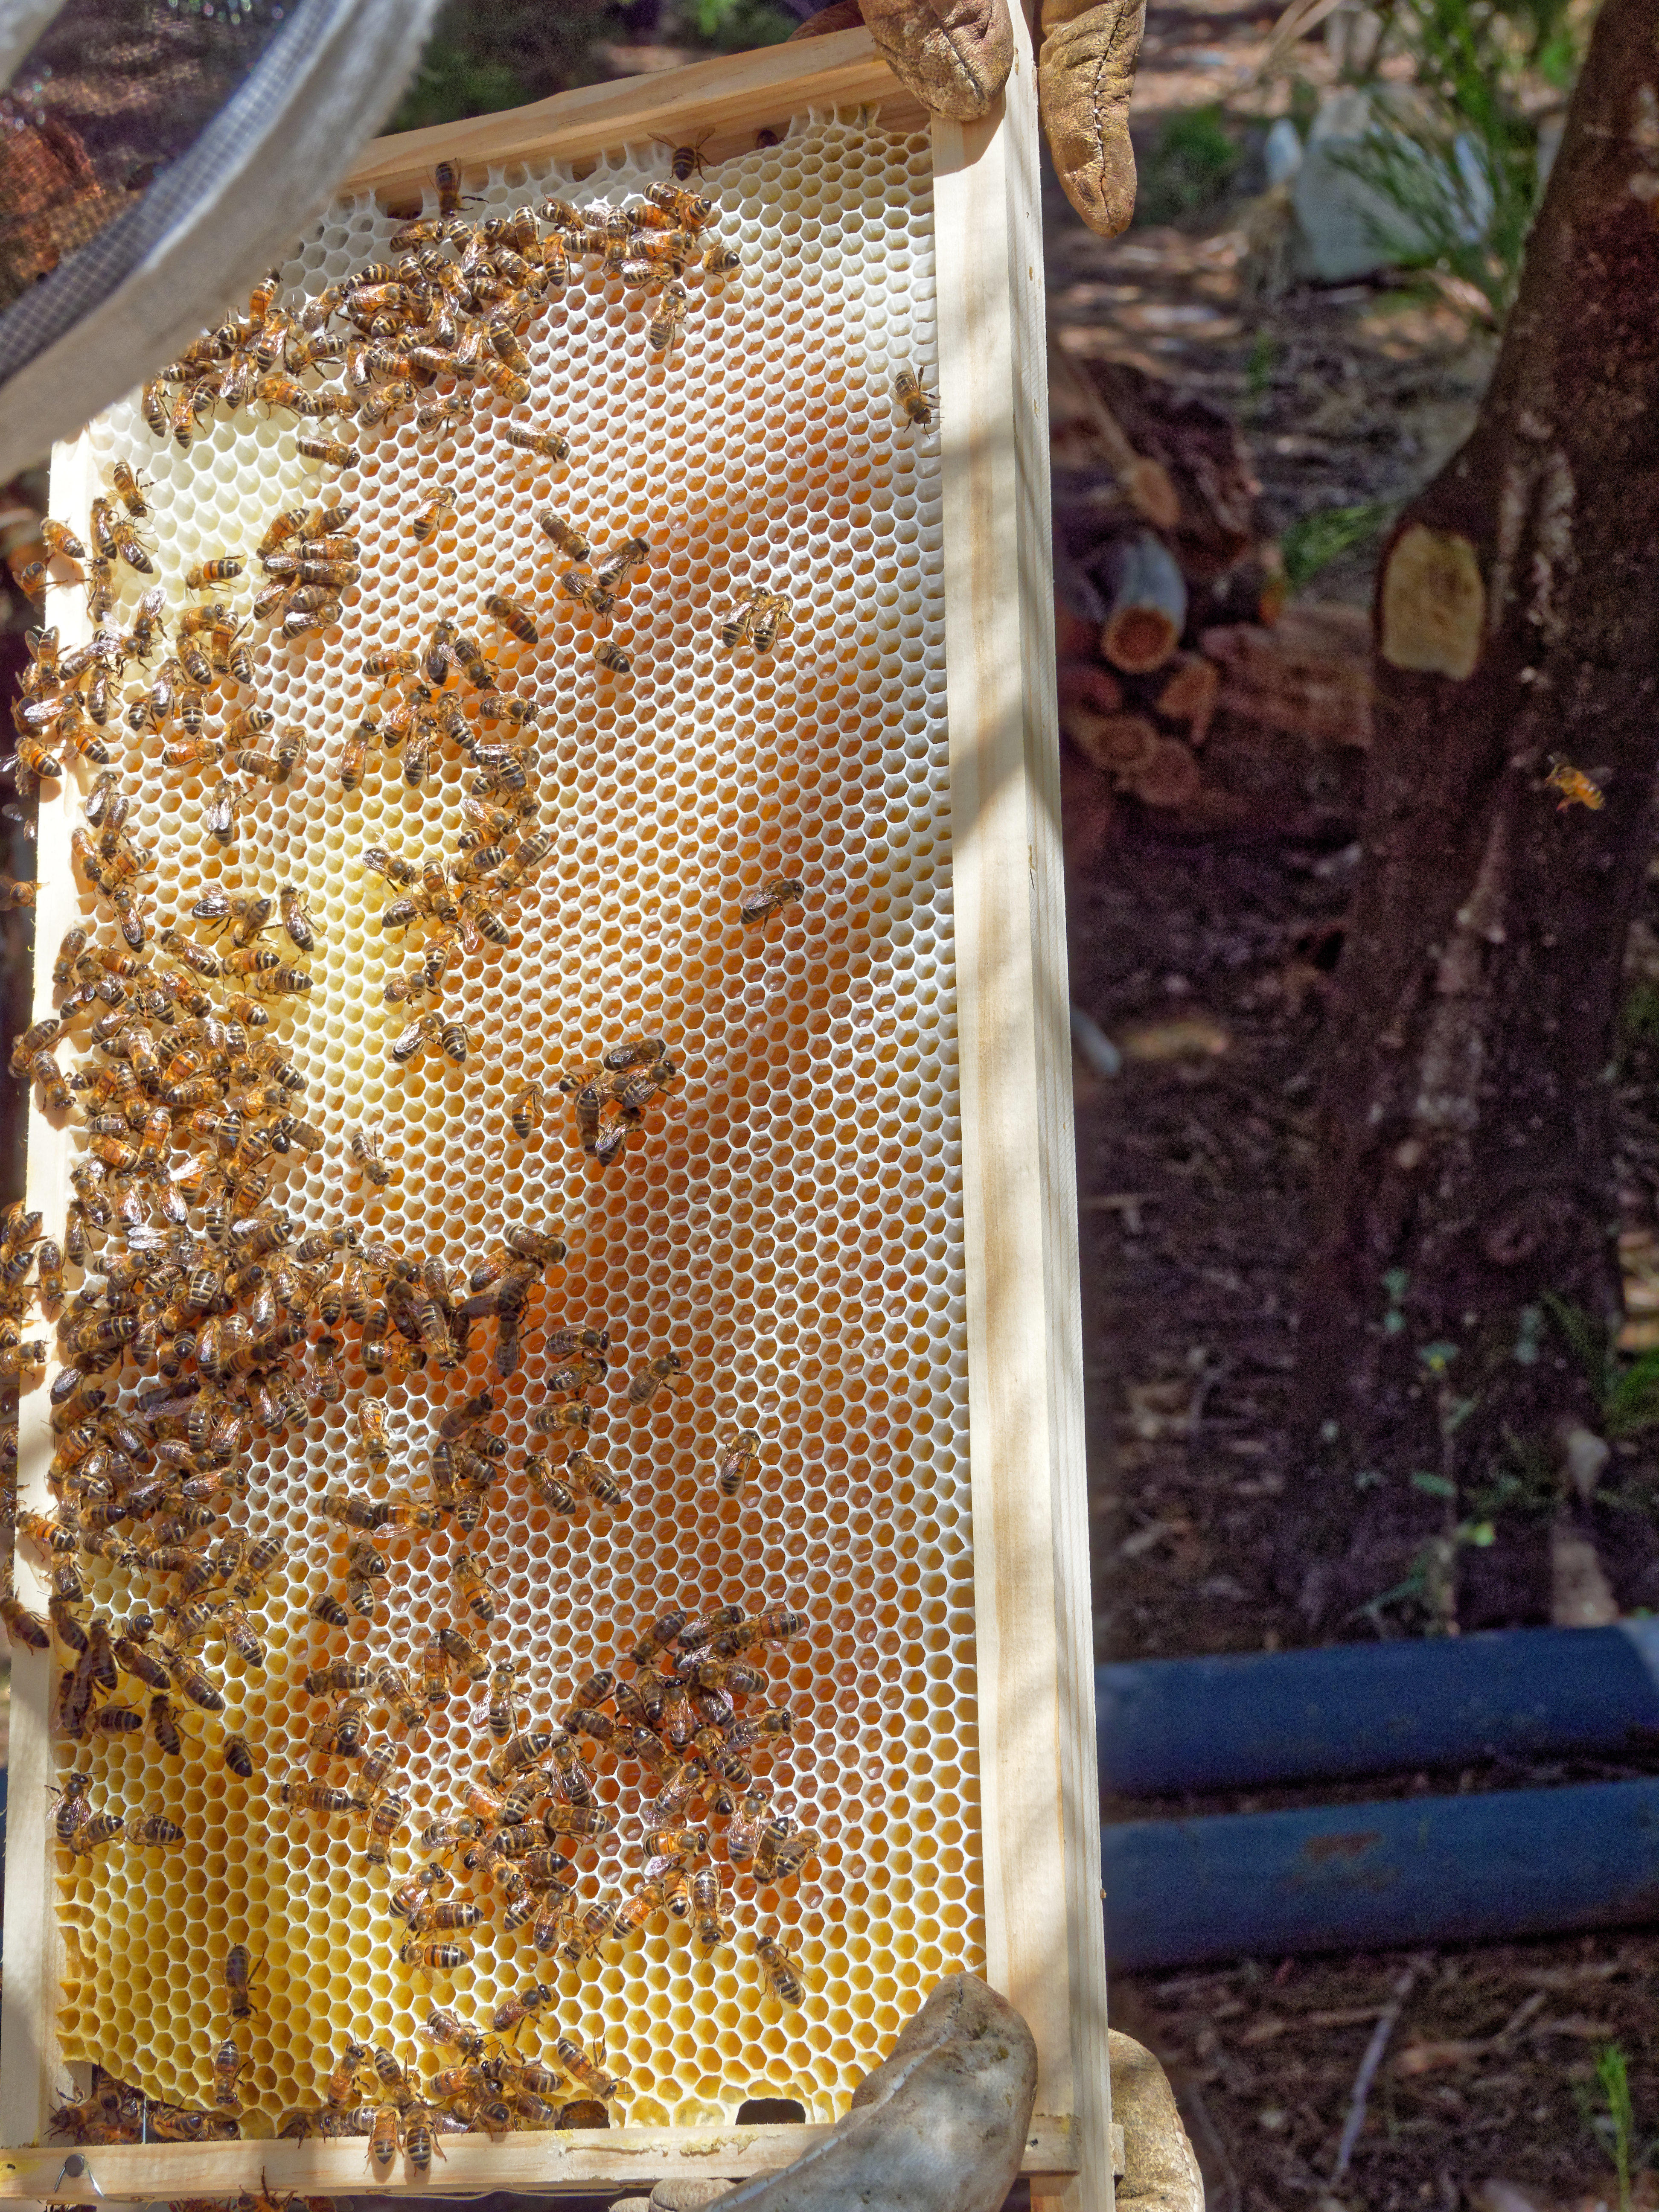 Inspecting-beehives-29.jpeg